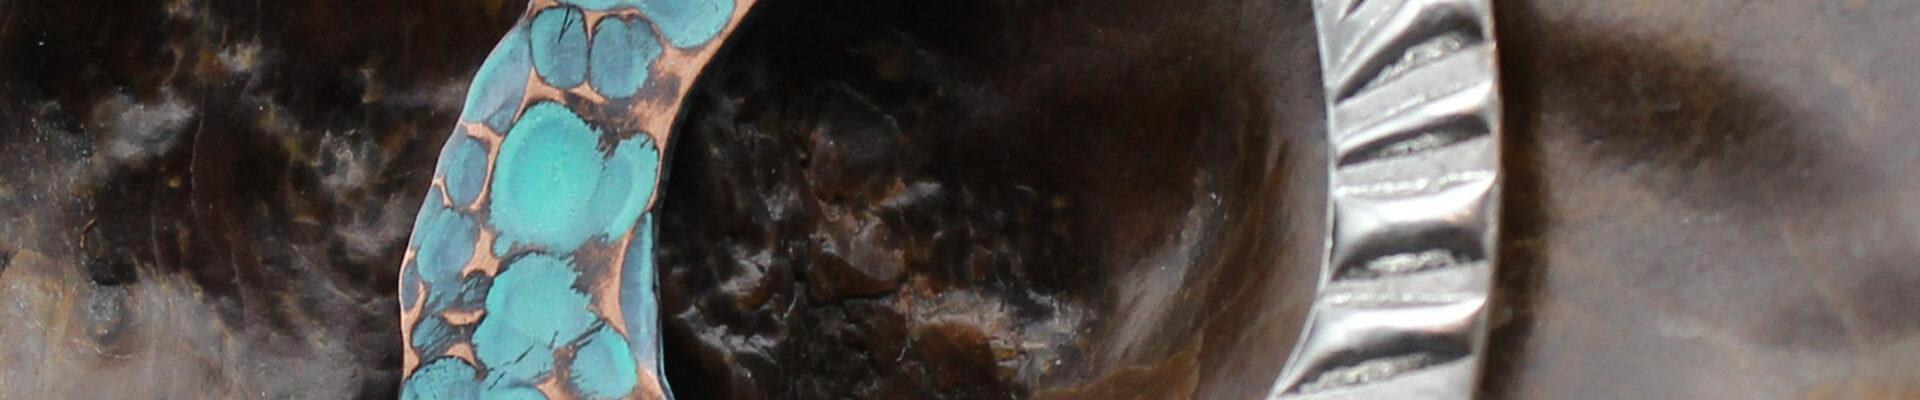 Molten Metal, Handmade Silver & Copper Necklace